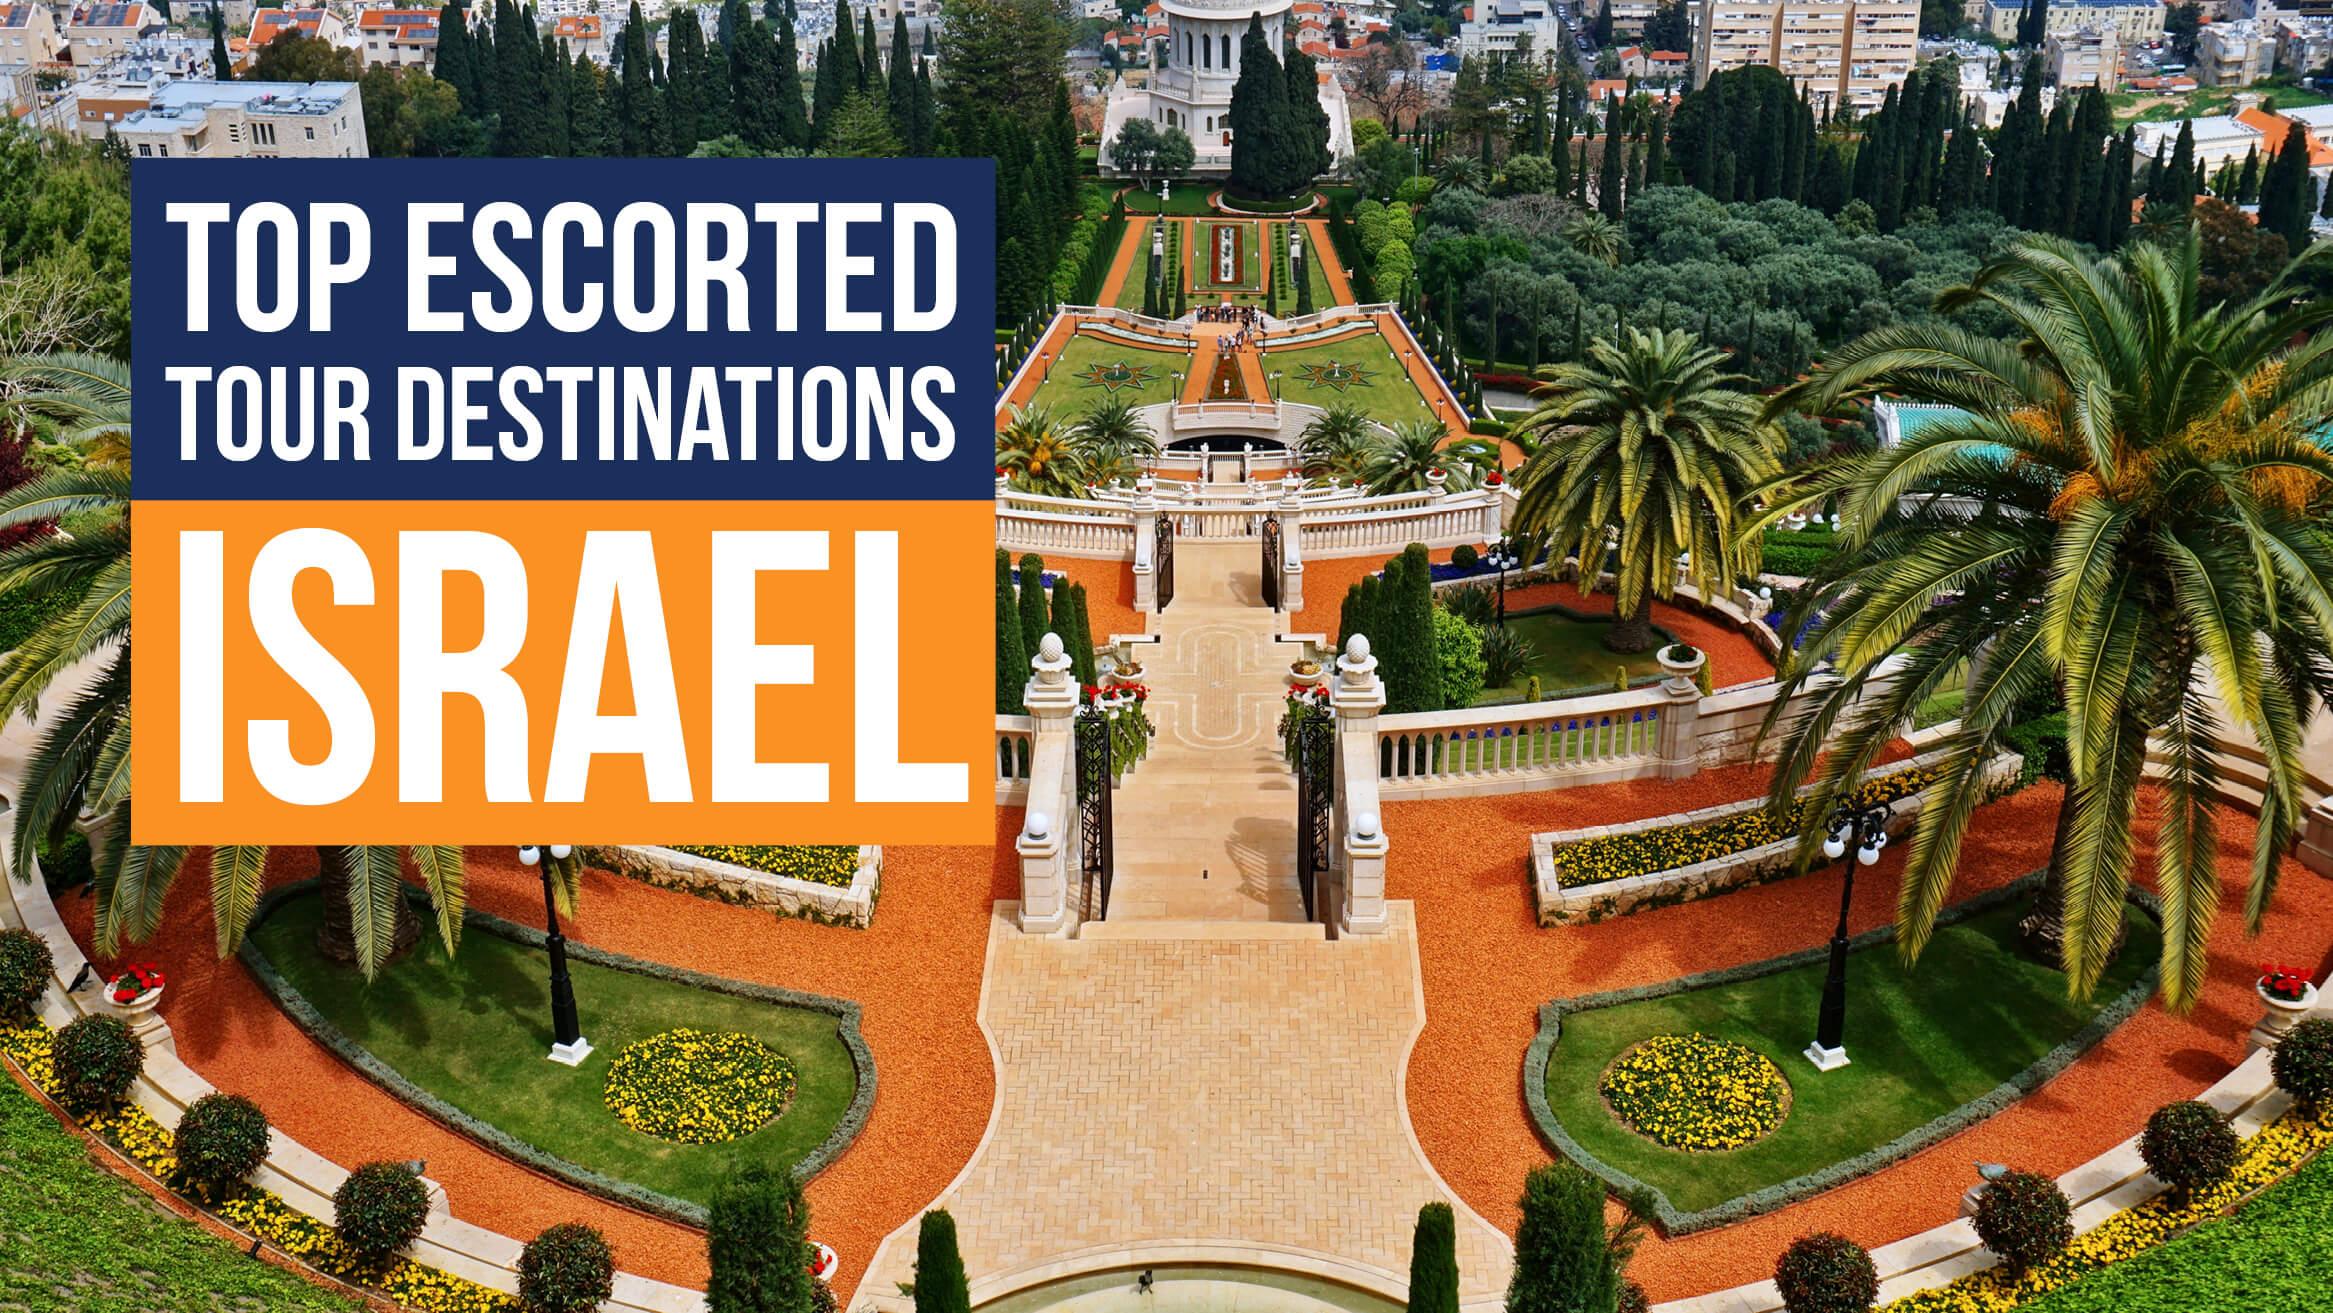 Top Escorted Tour Destinations Worldwide / Israel header